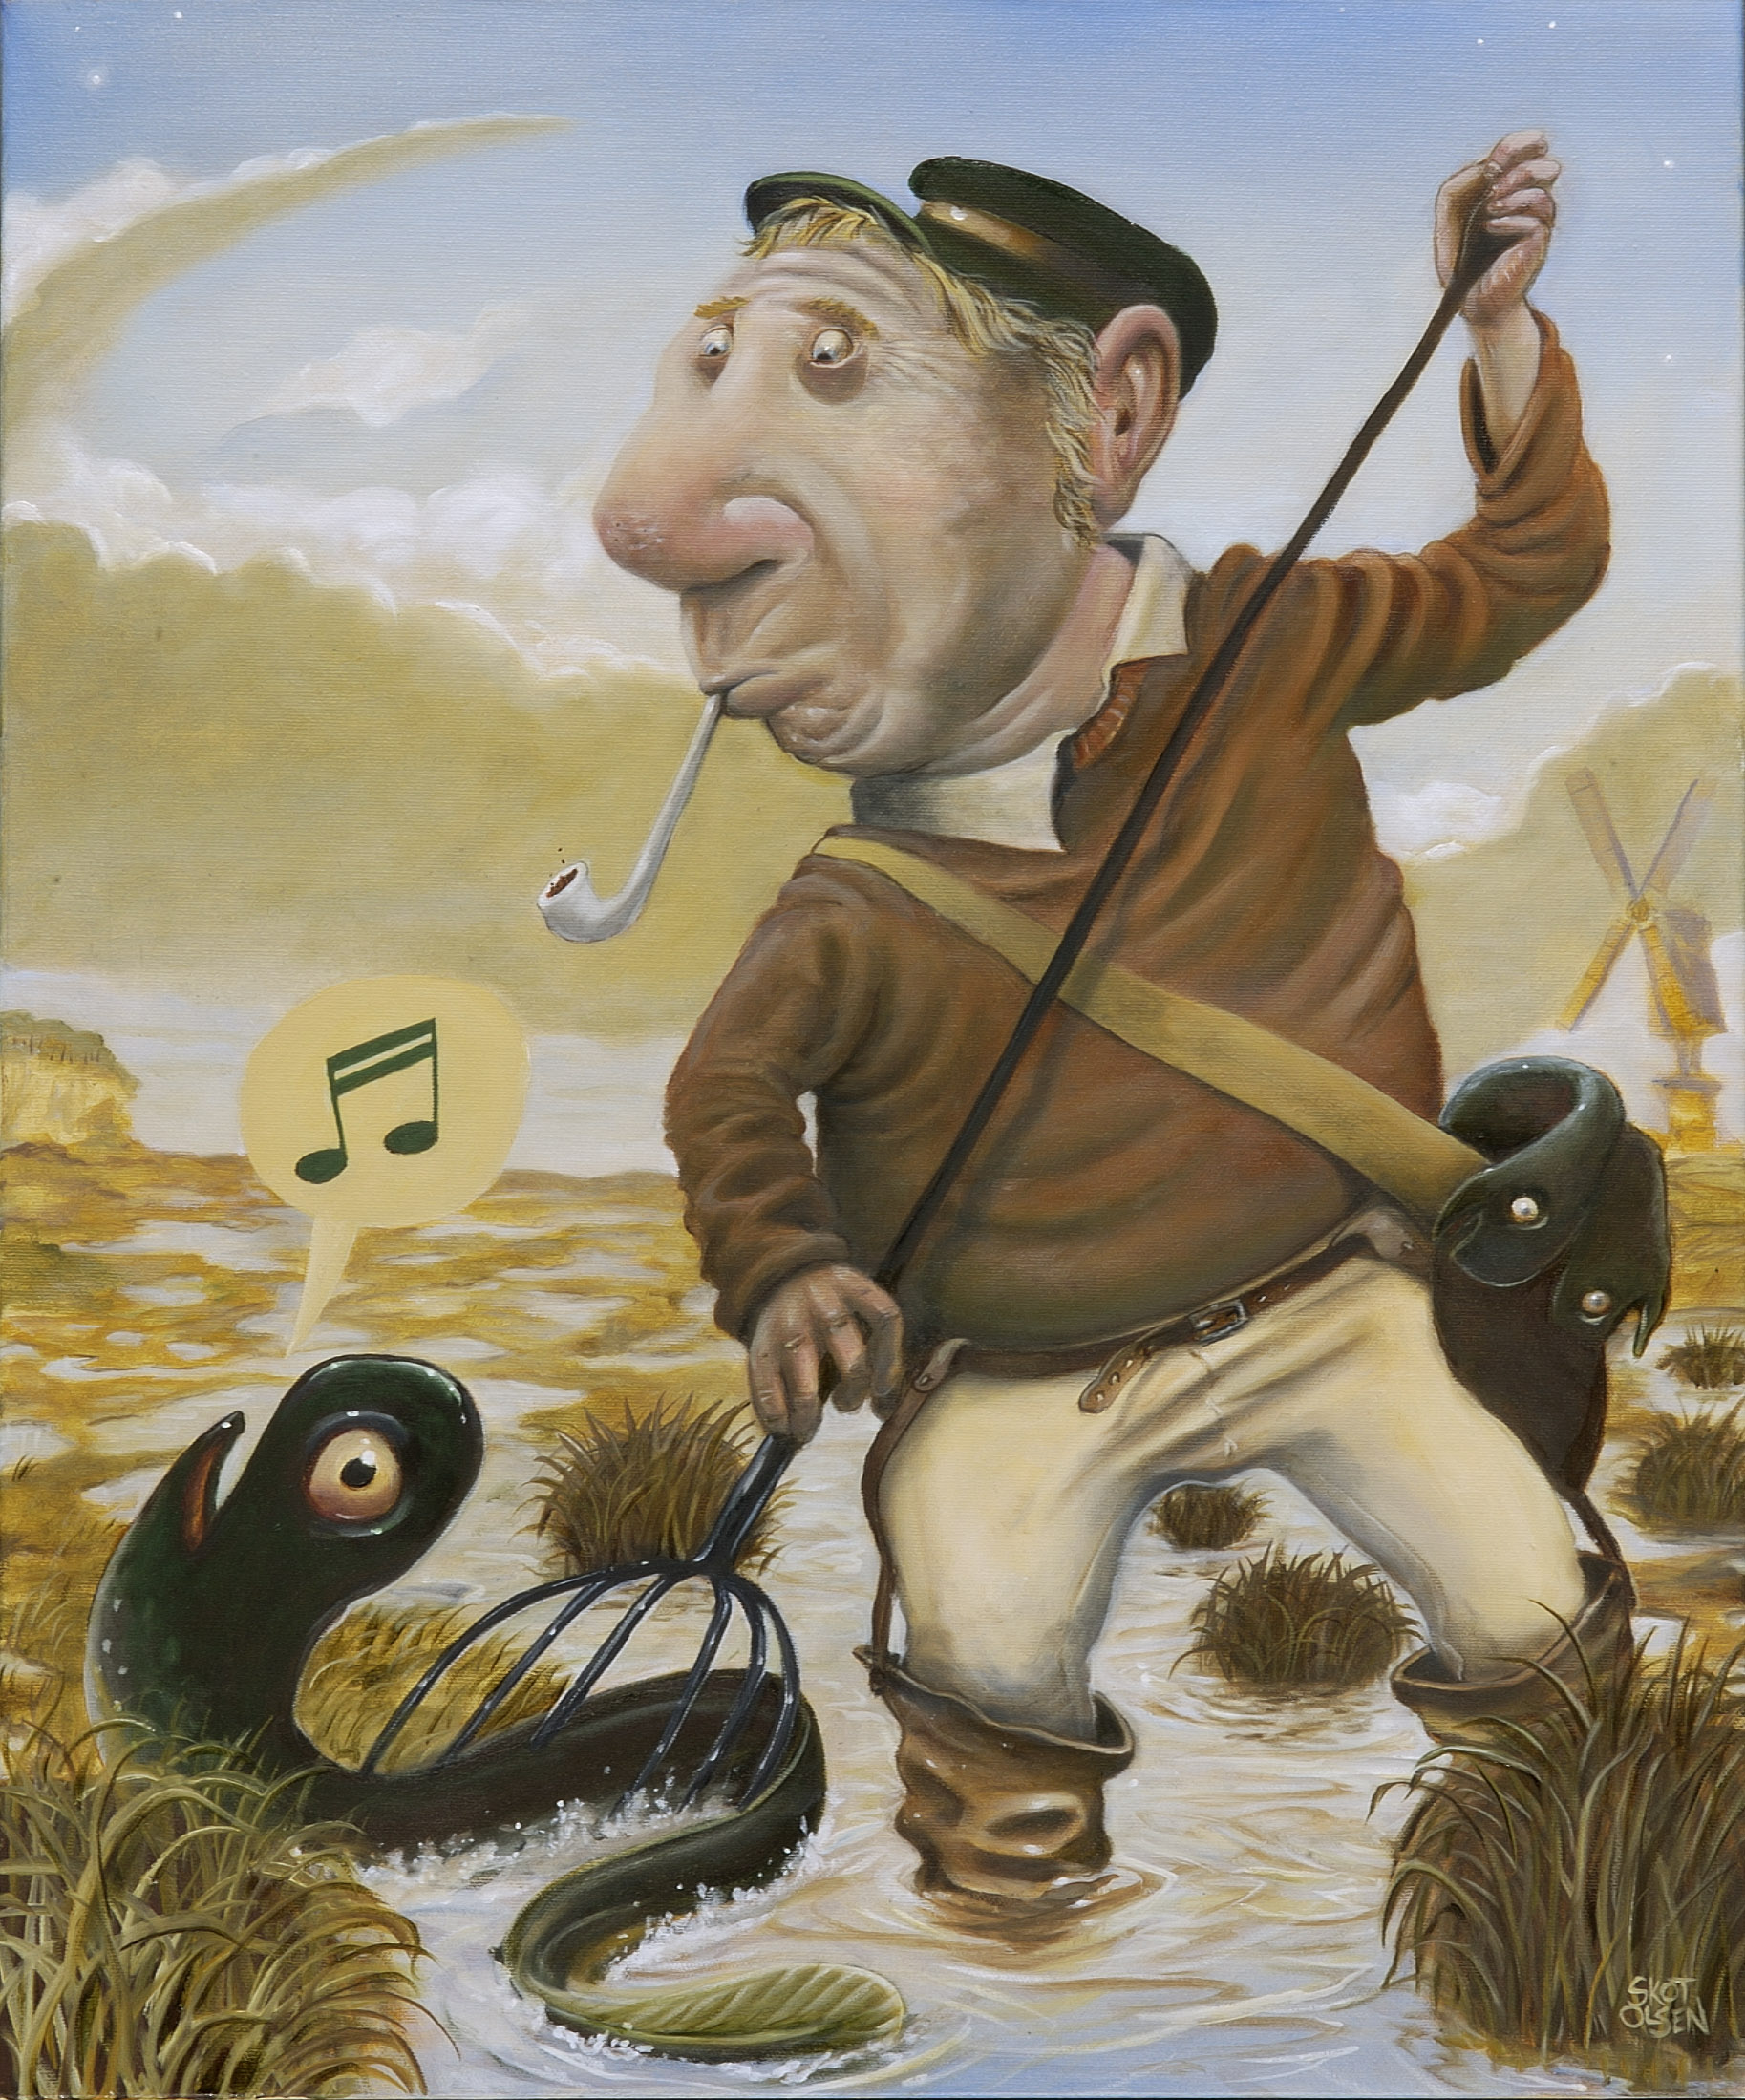 The Singing Eel